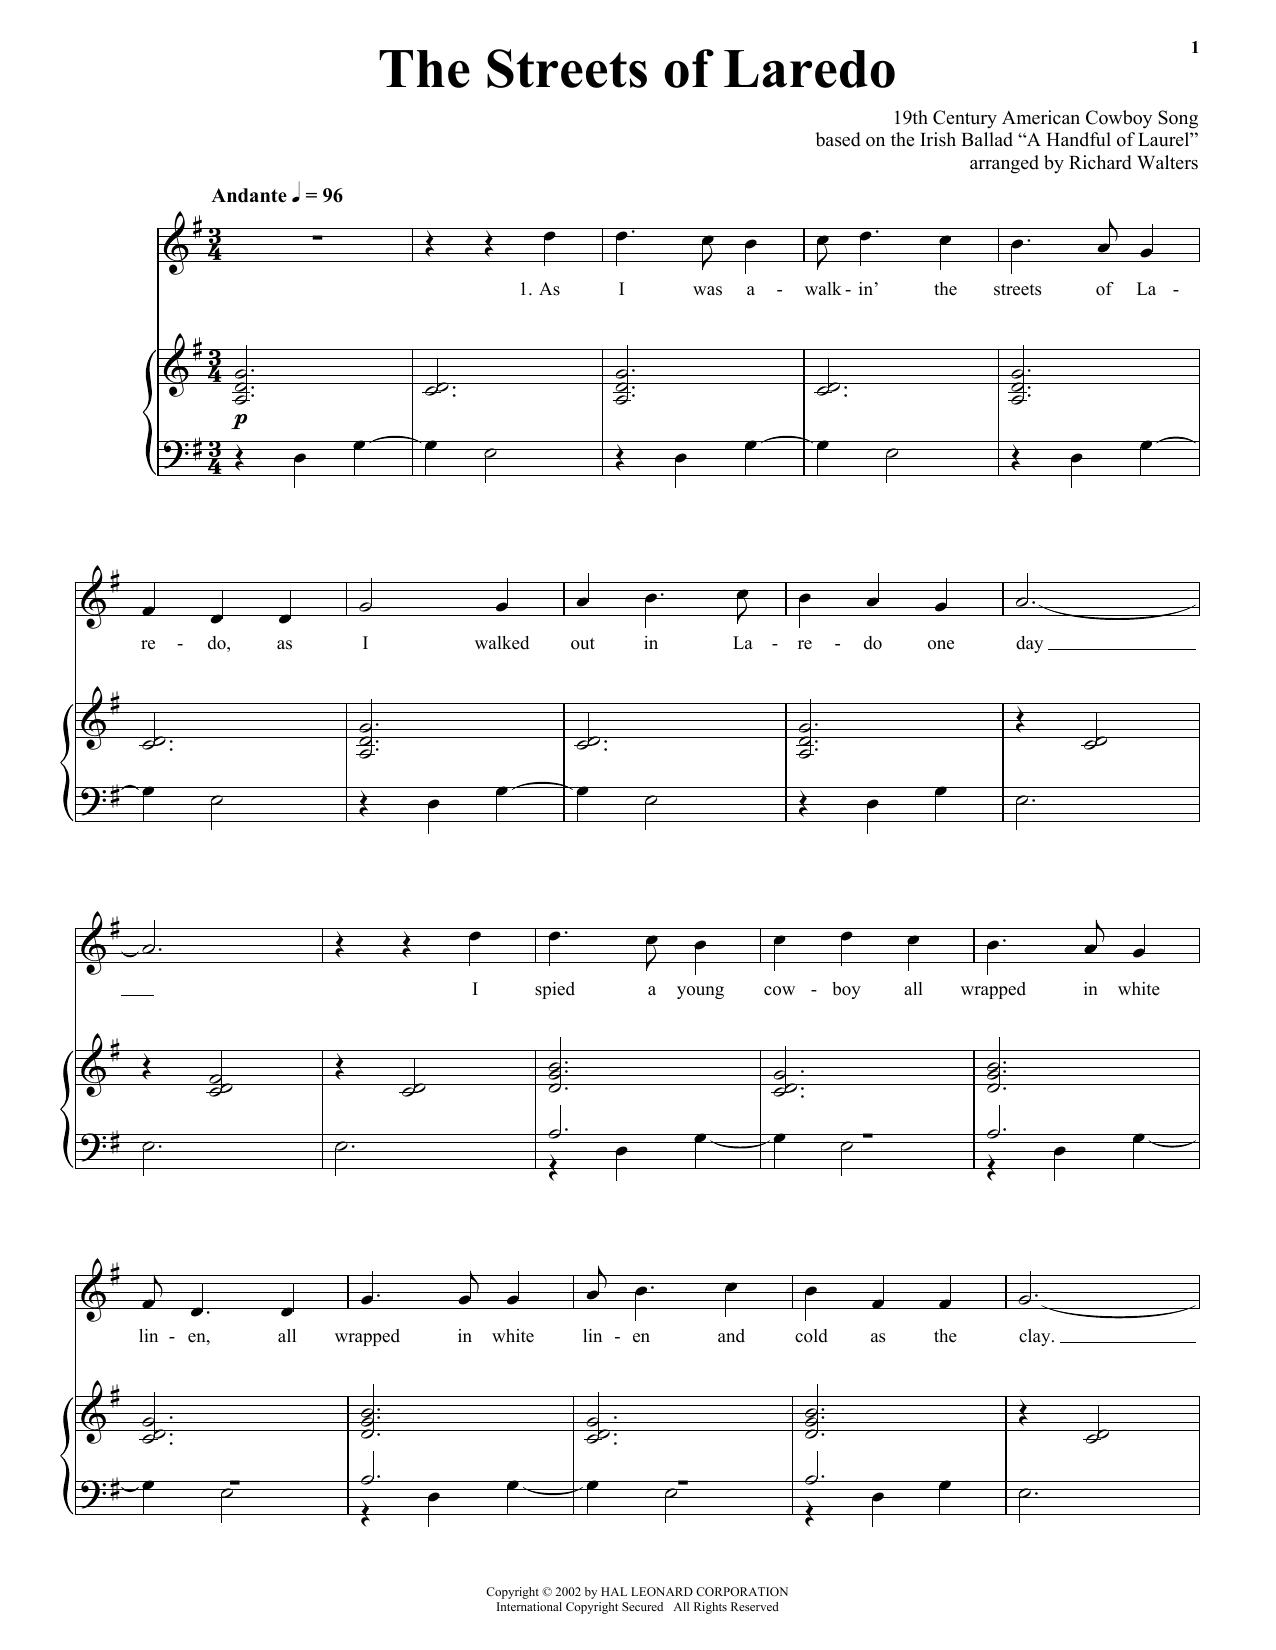 American Cowboy Song The Streets Of Laredo Sheet Music Notes, Chords    Download Printable Guitar Chords/Lyrics PDF Score   SKU 15